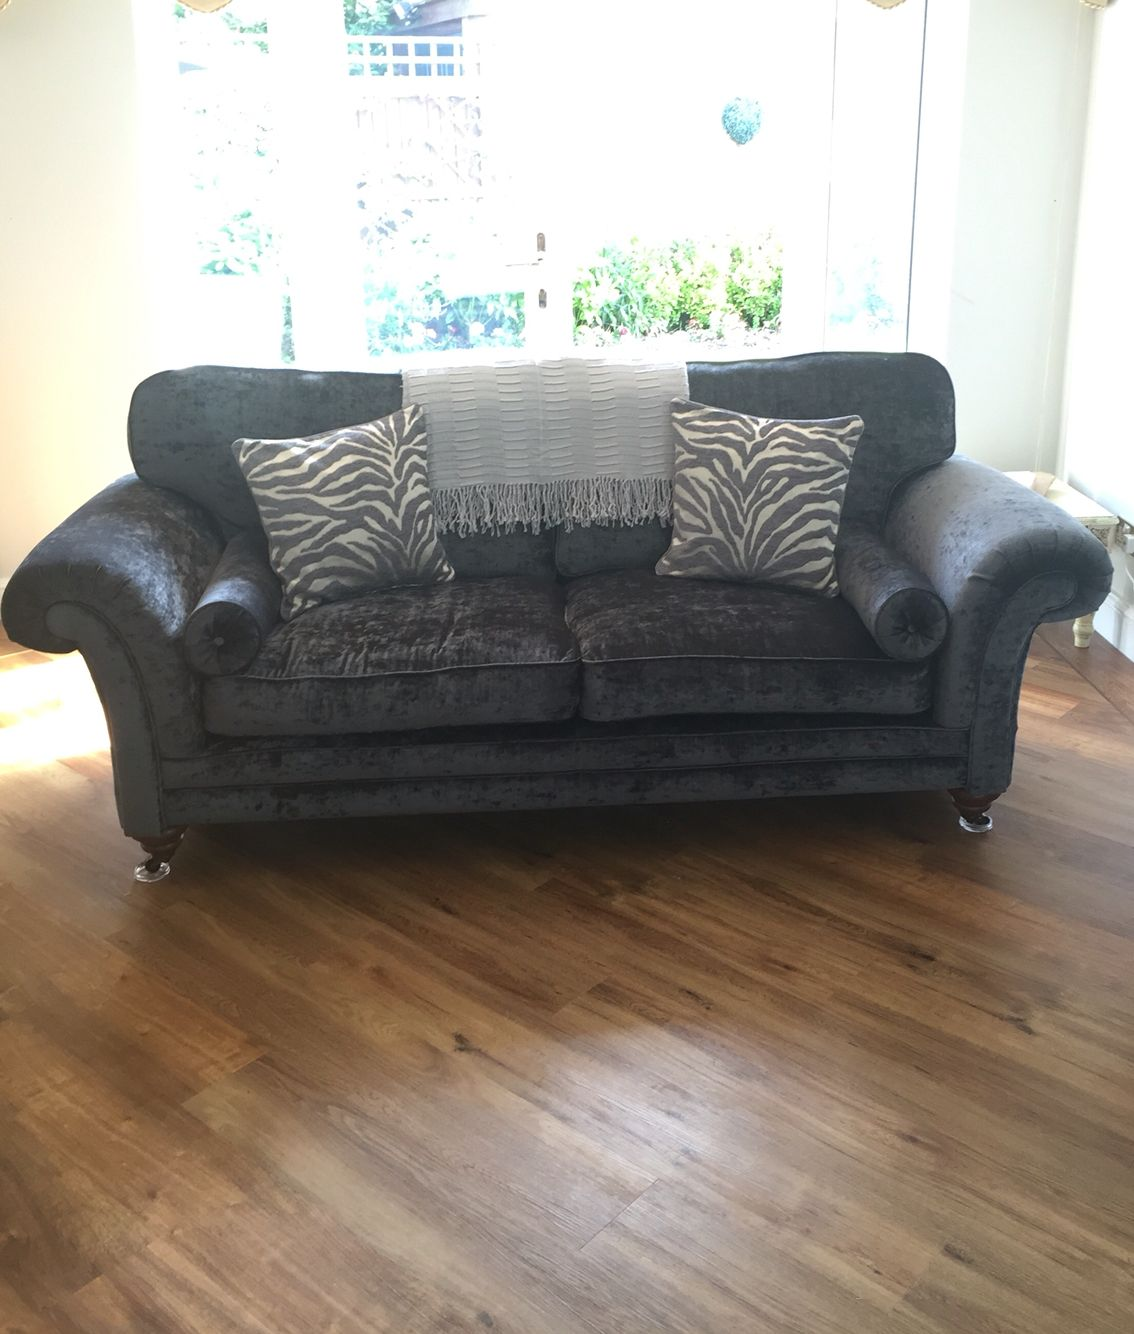 Lansdowne 3 Seater Sofa Paoletti Grey Zebra Print Cushions Grey Room Sofa Printed Cushions